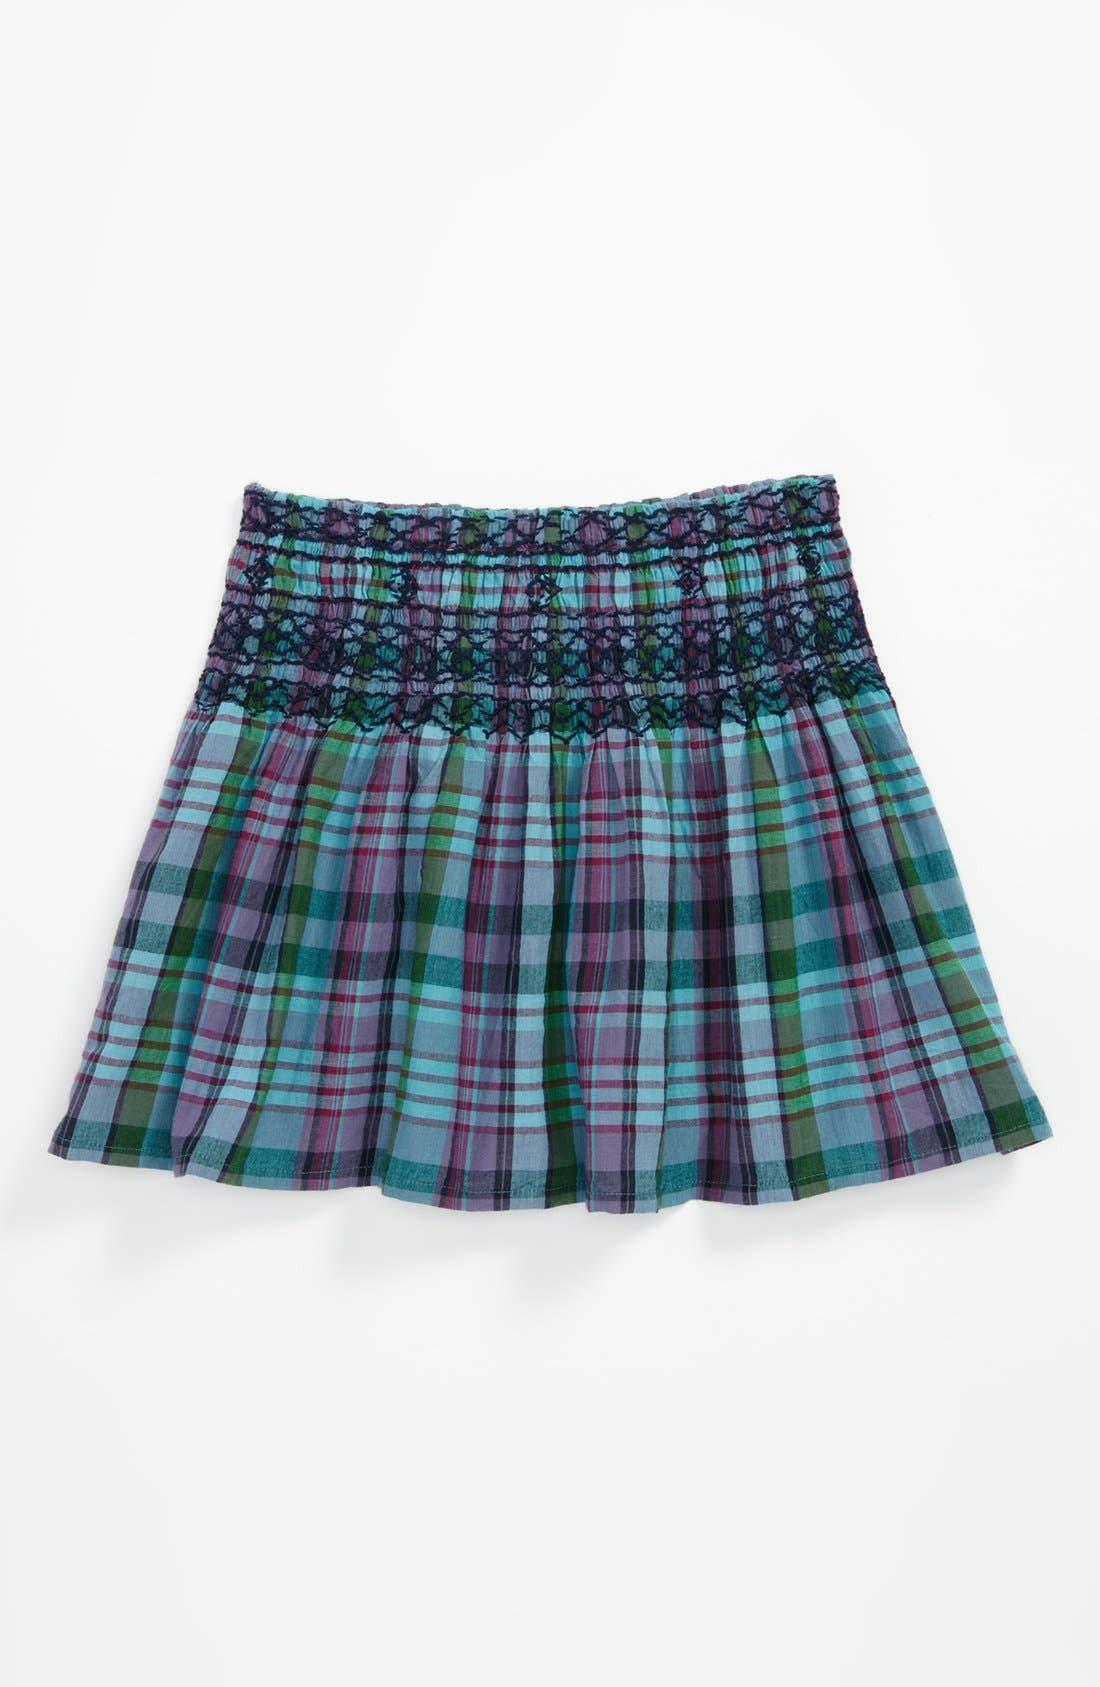 Alternate Image 1 Selected - Peek 'Pixi' Skirt (Toddler, Little Girls & Big Girls)